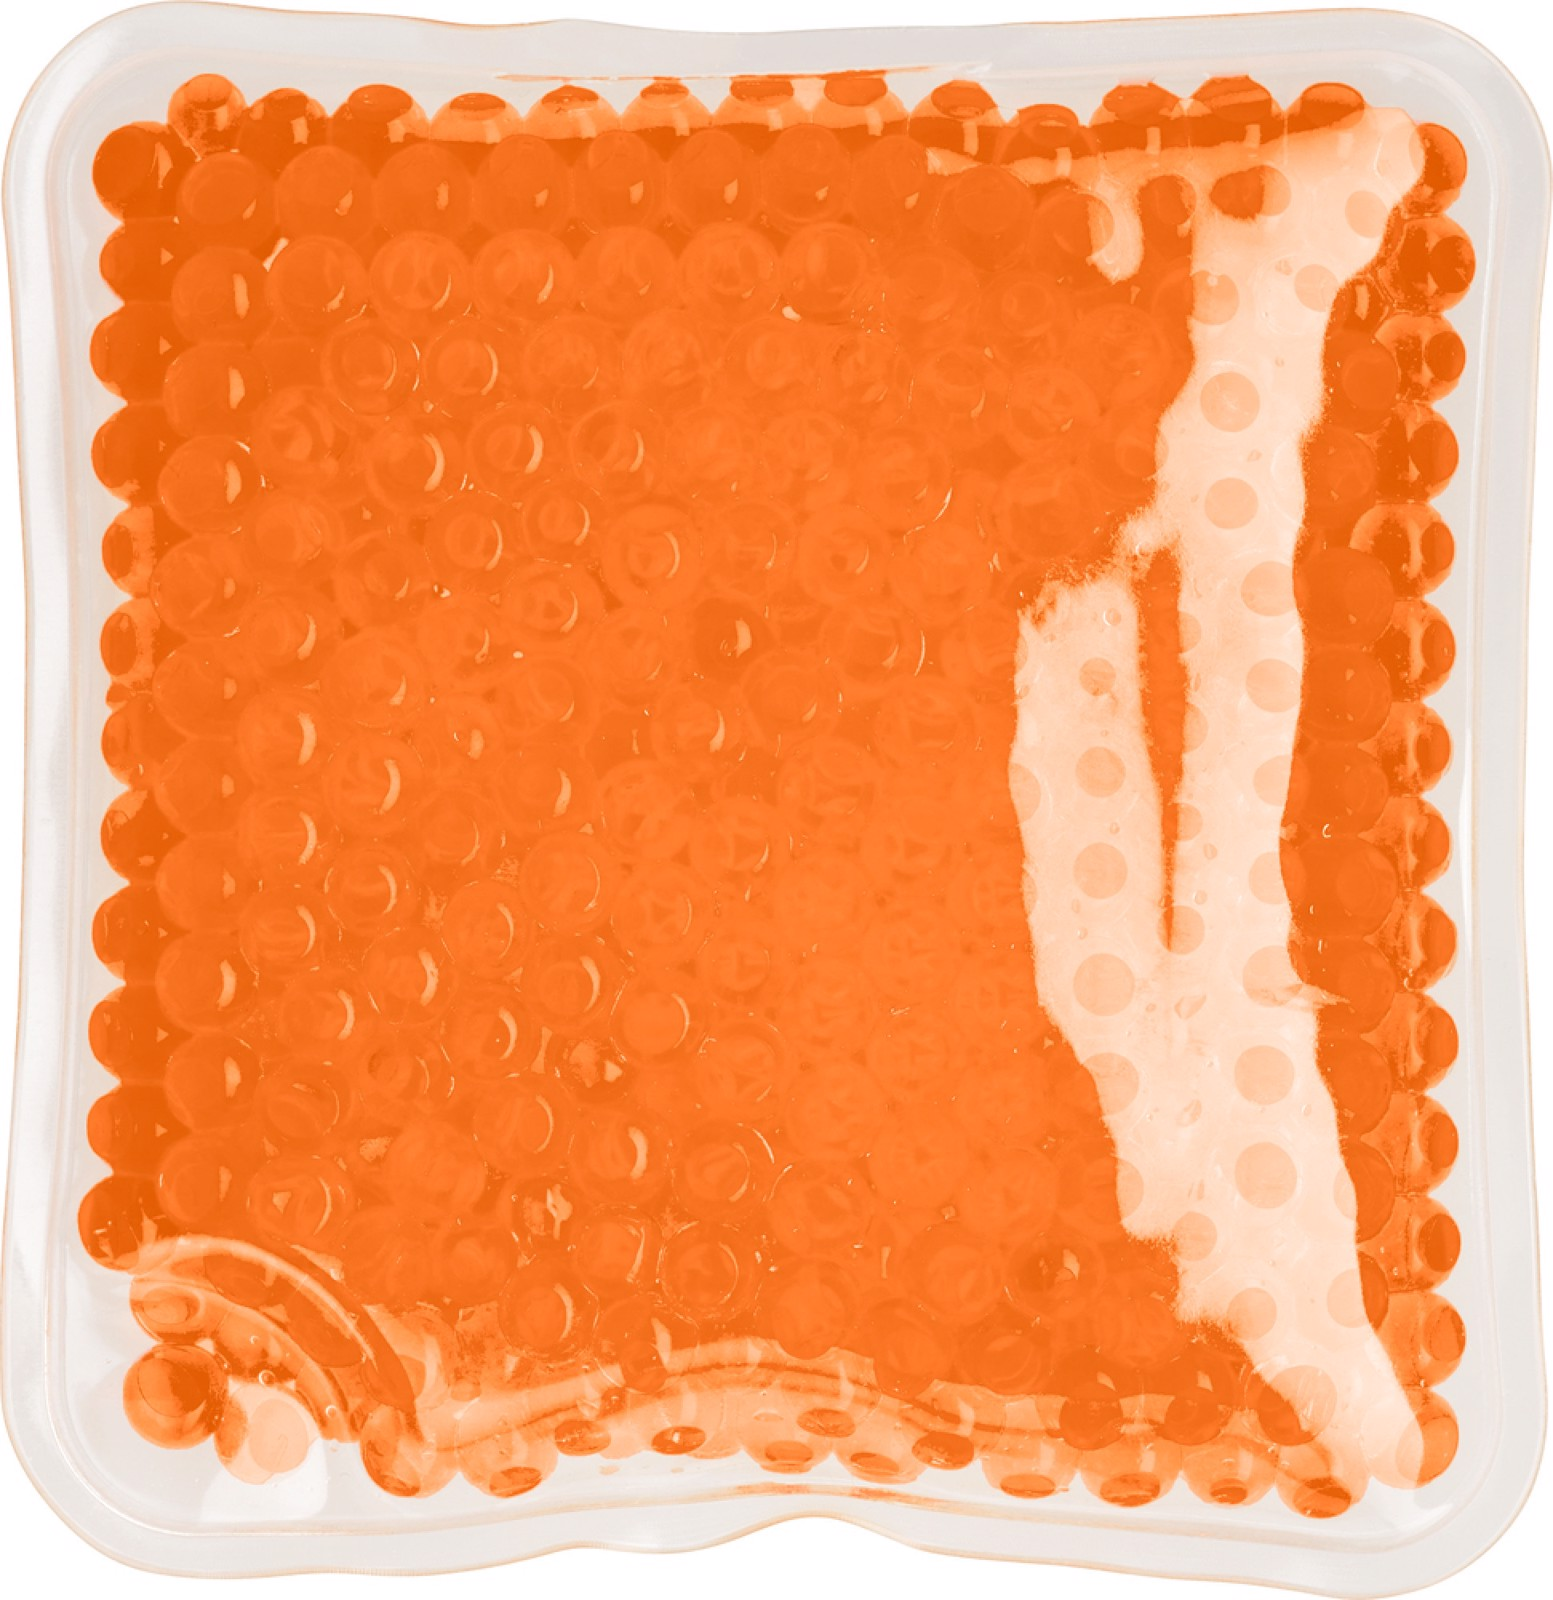 PVC hot/cold pack - Orange